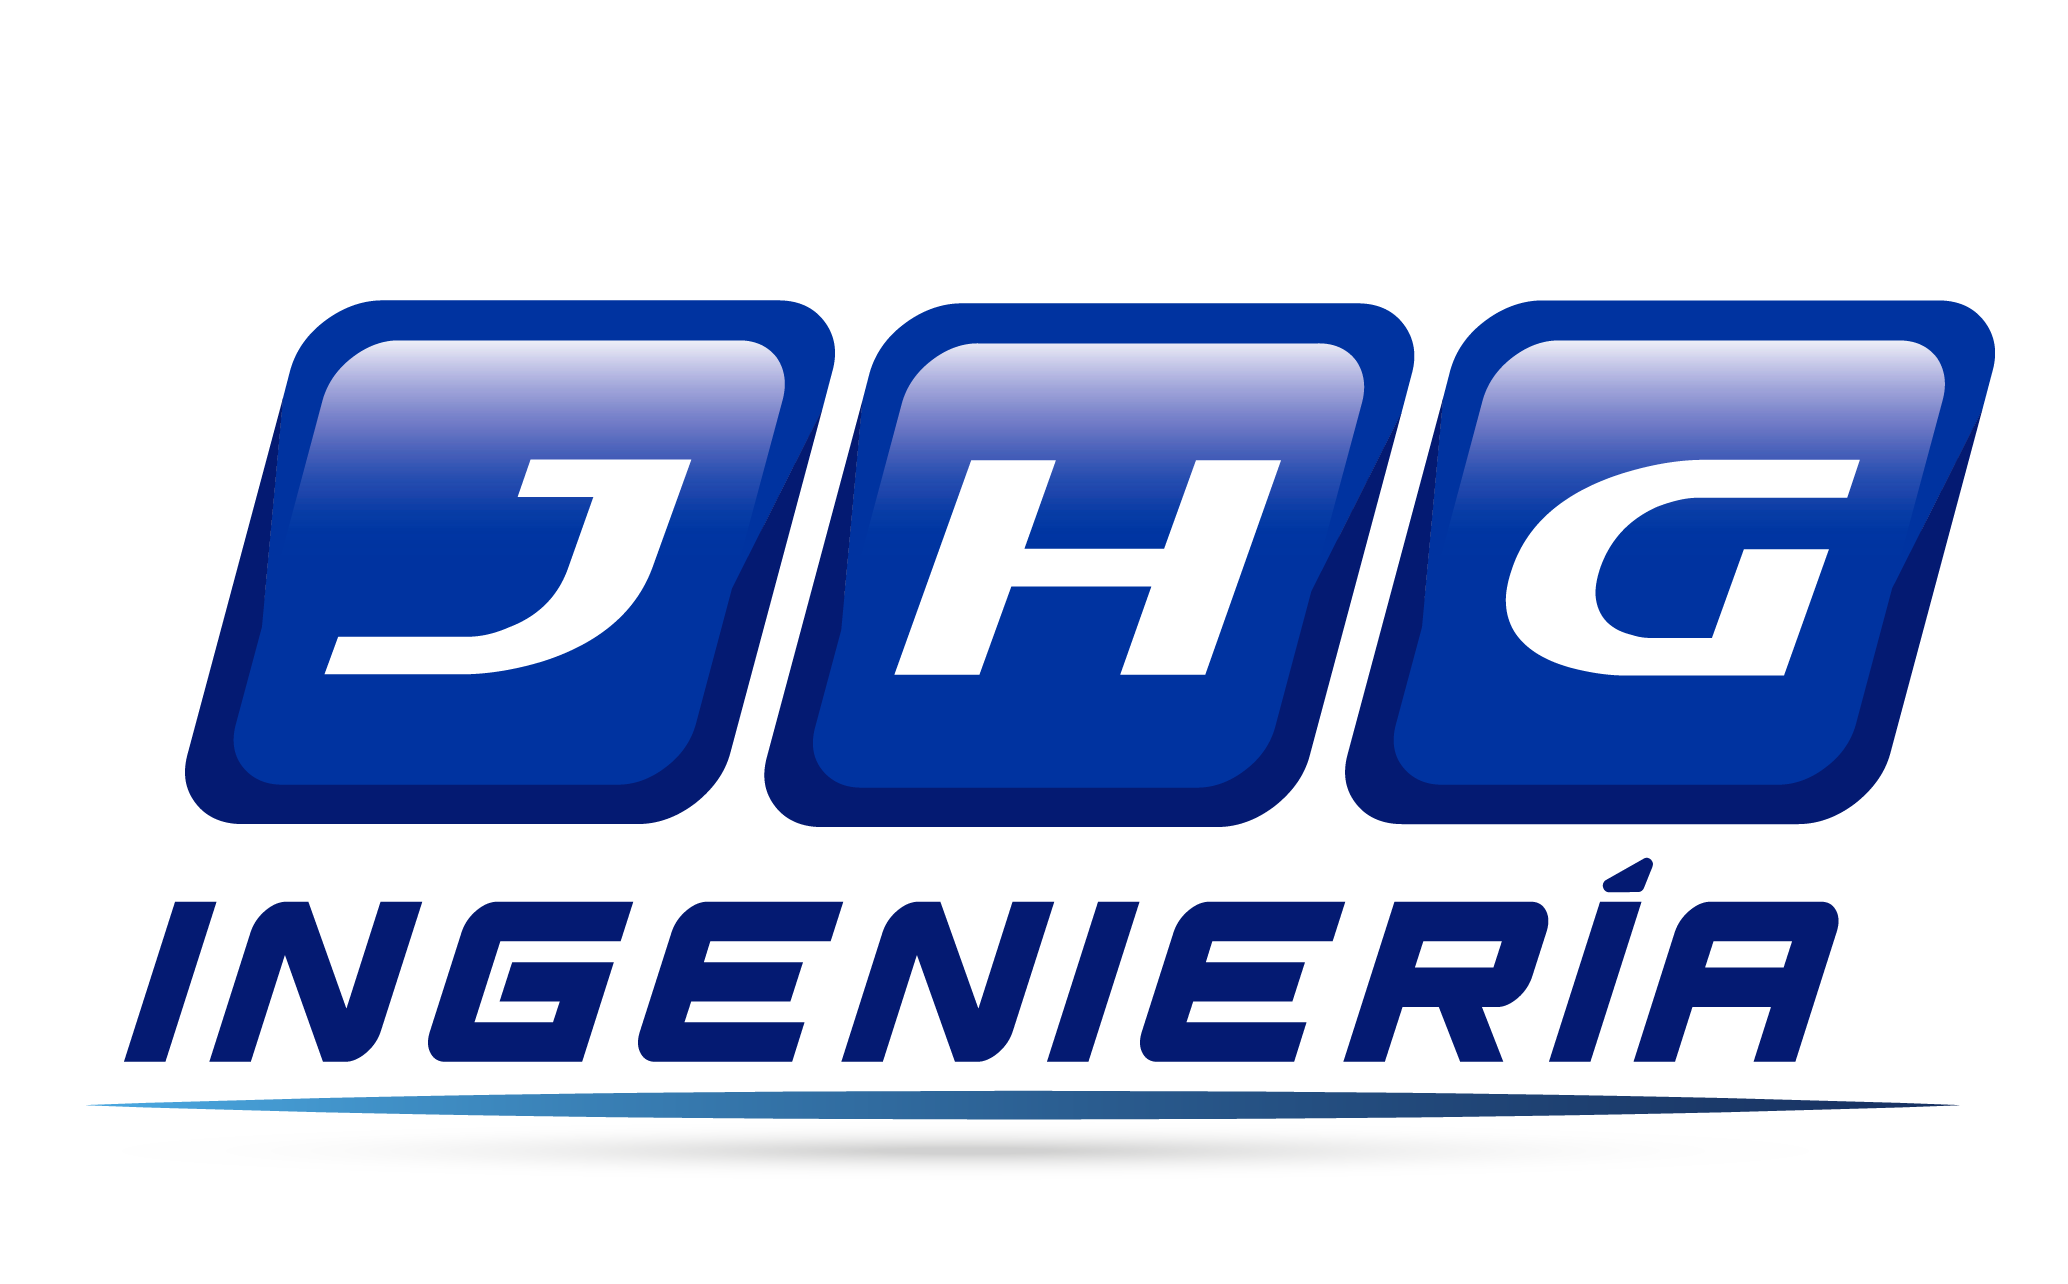 JHG Ingeniería